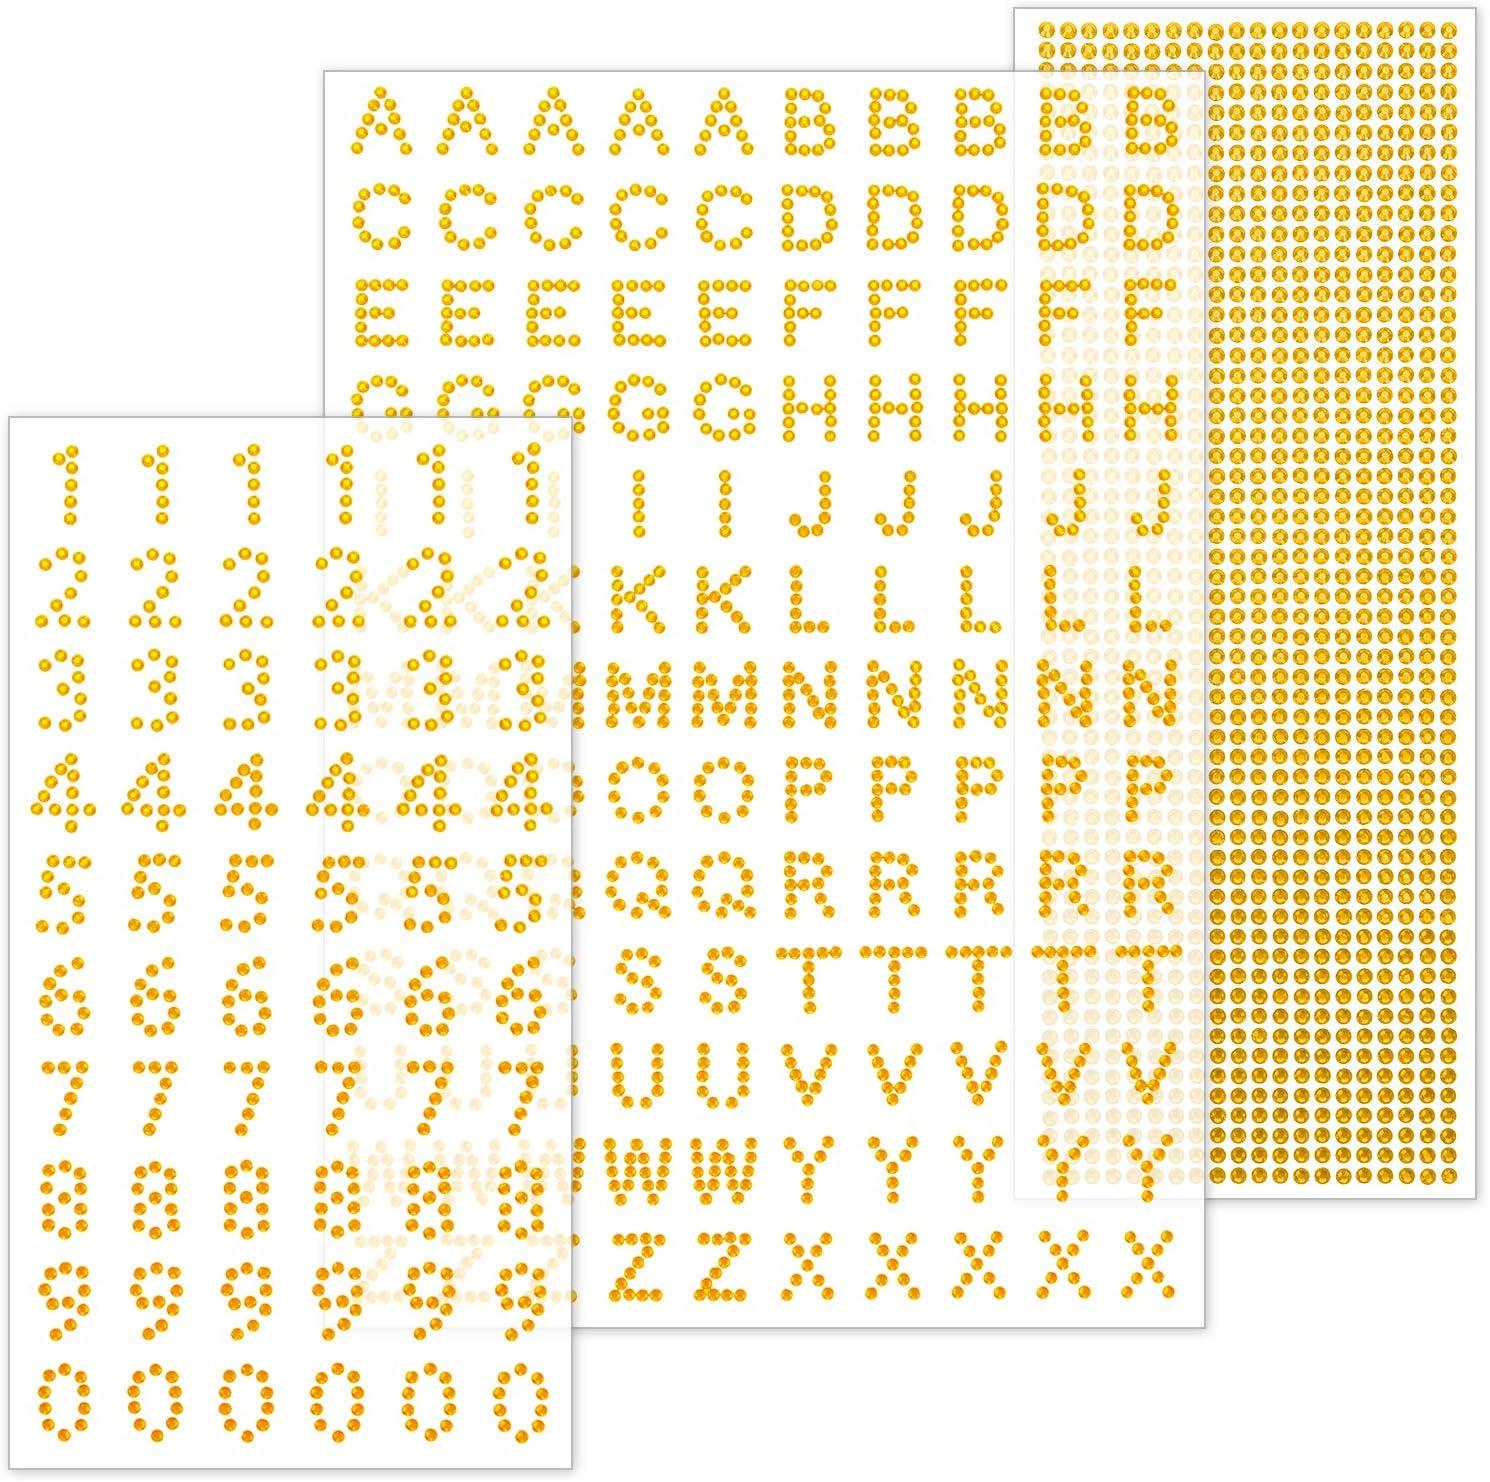 Konsait Grad Cap Decoration Set Peel and Stick Glitter Alphabet Letter Stickers and Number Sticker Gemstone Border Stickers for Graduation Cap Accessory School Leavers Book or Handicraft Art Gold